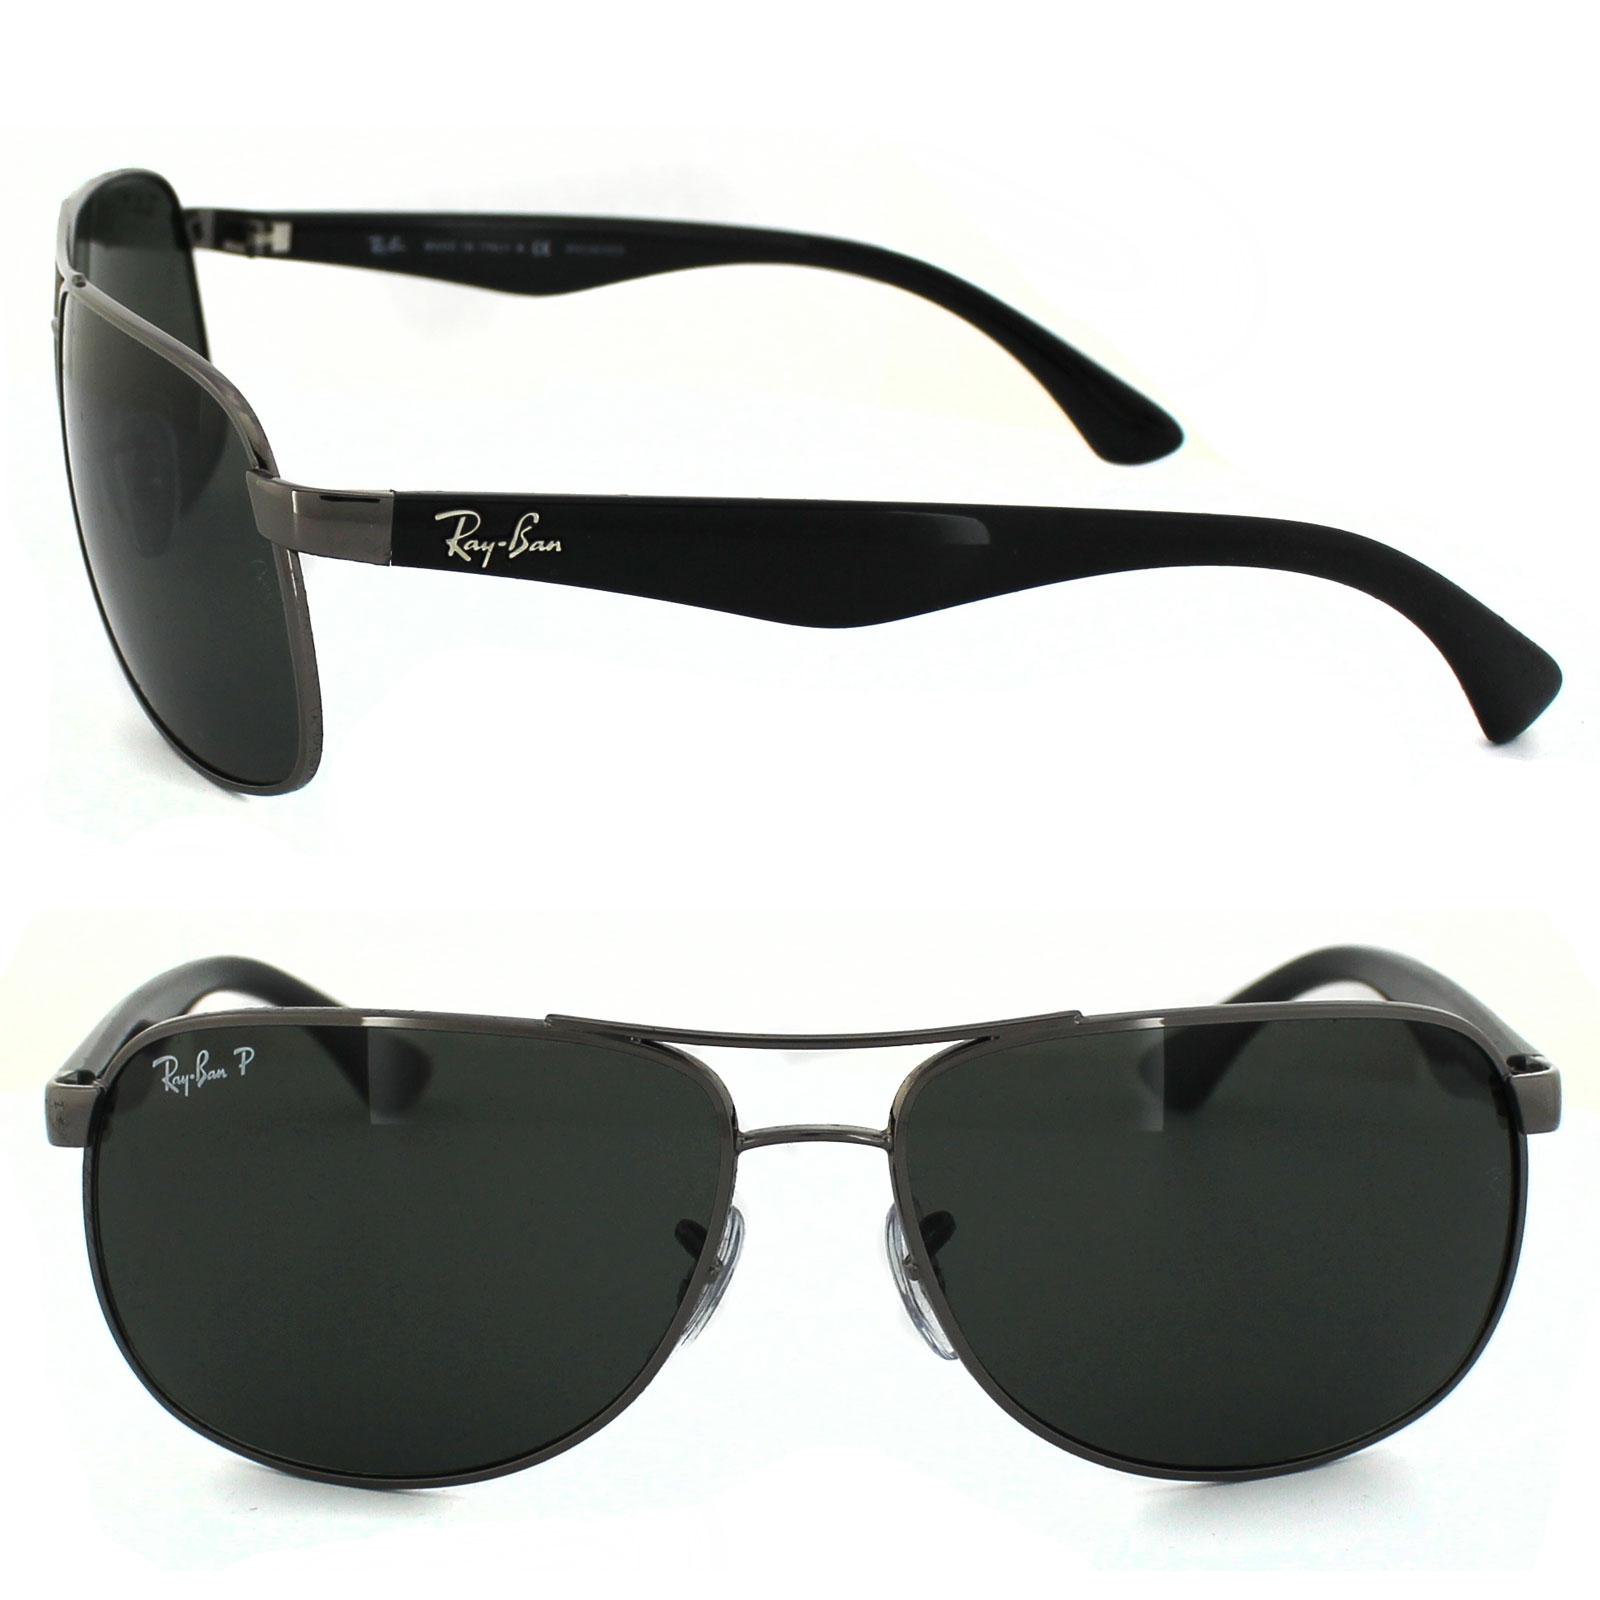 Cheap Ray Ban 3502 Sunglasses Discounted Sunglasses